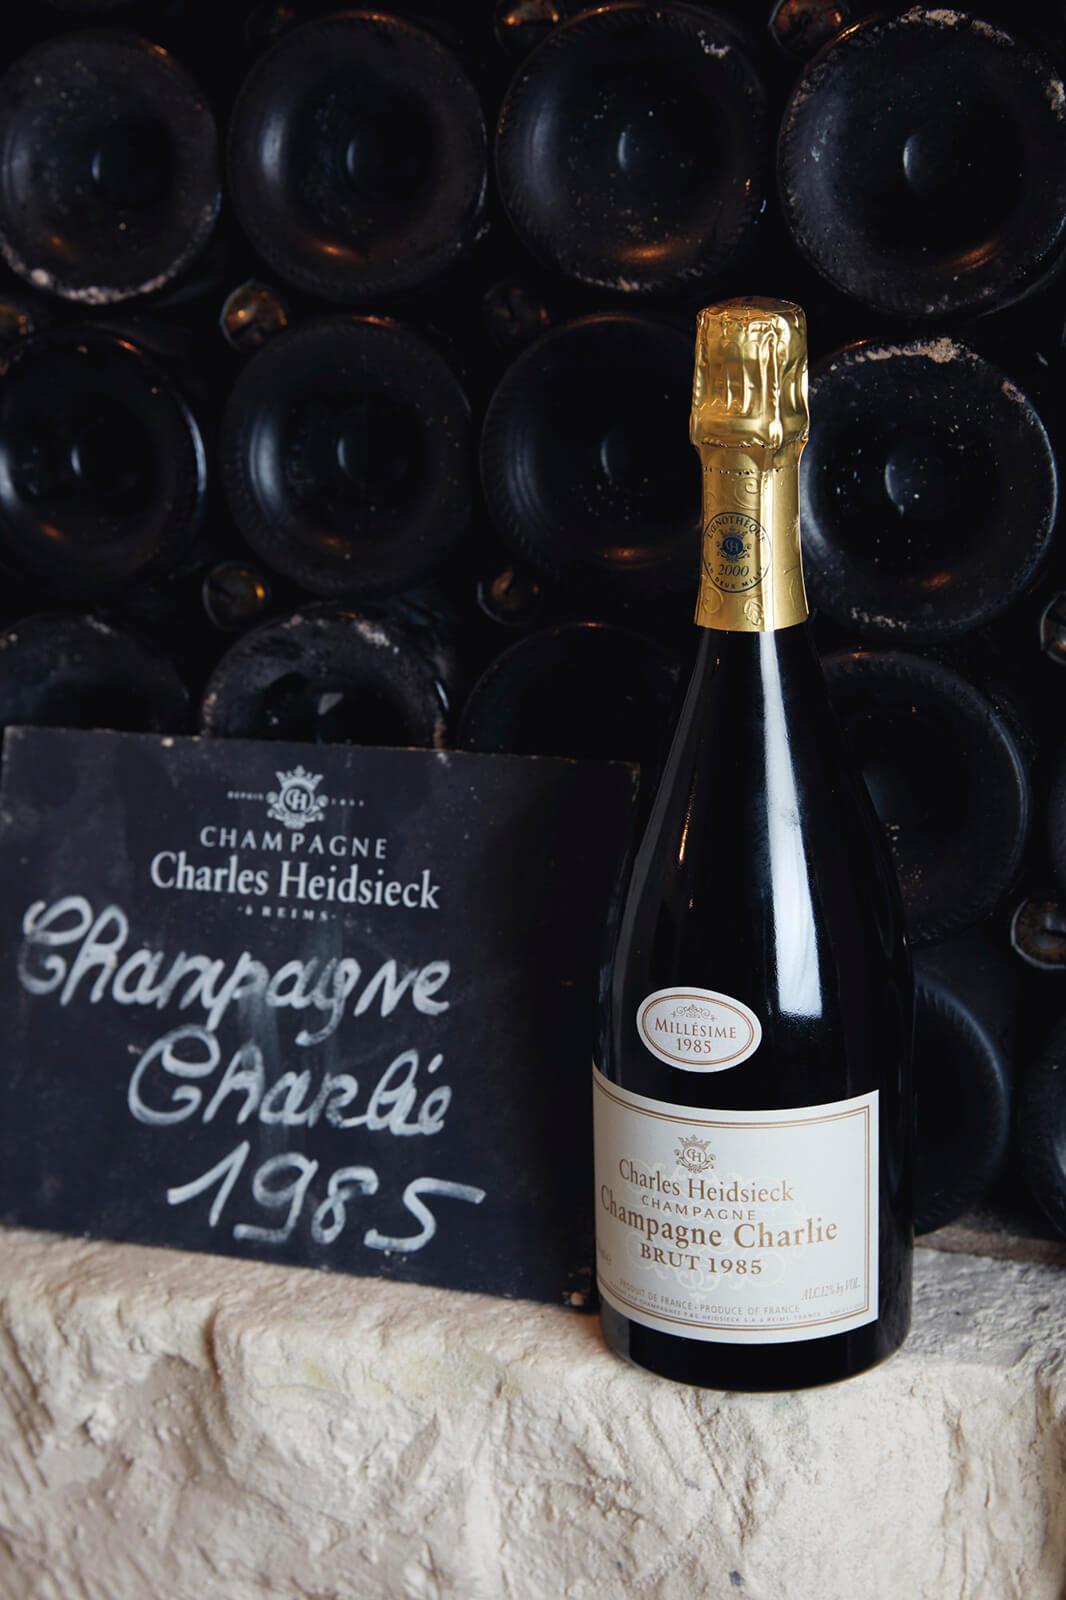 Charles Heidsieck Champagne Charlie Brut 1985 (photo courtesy Christie's)